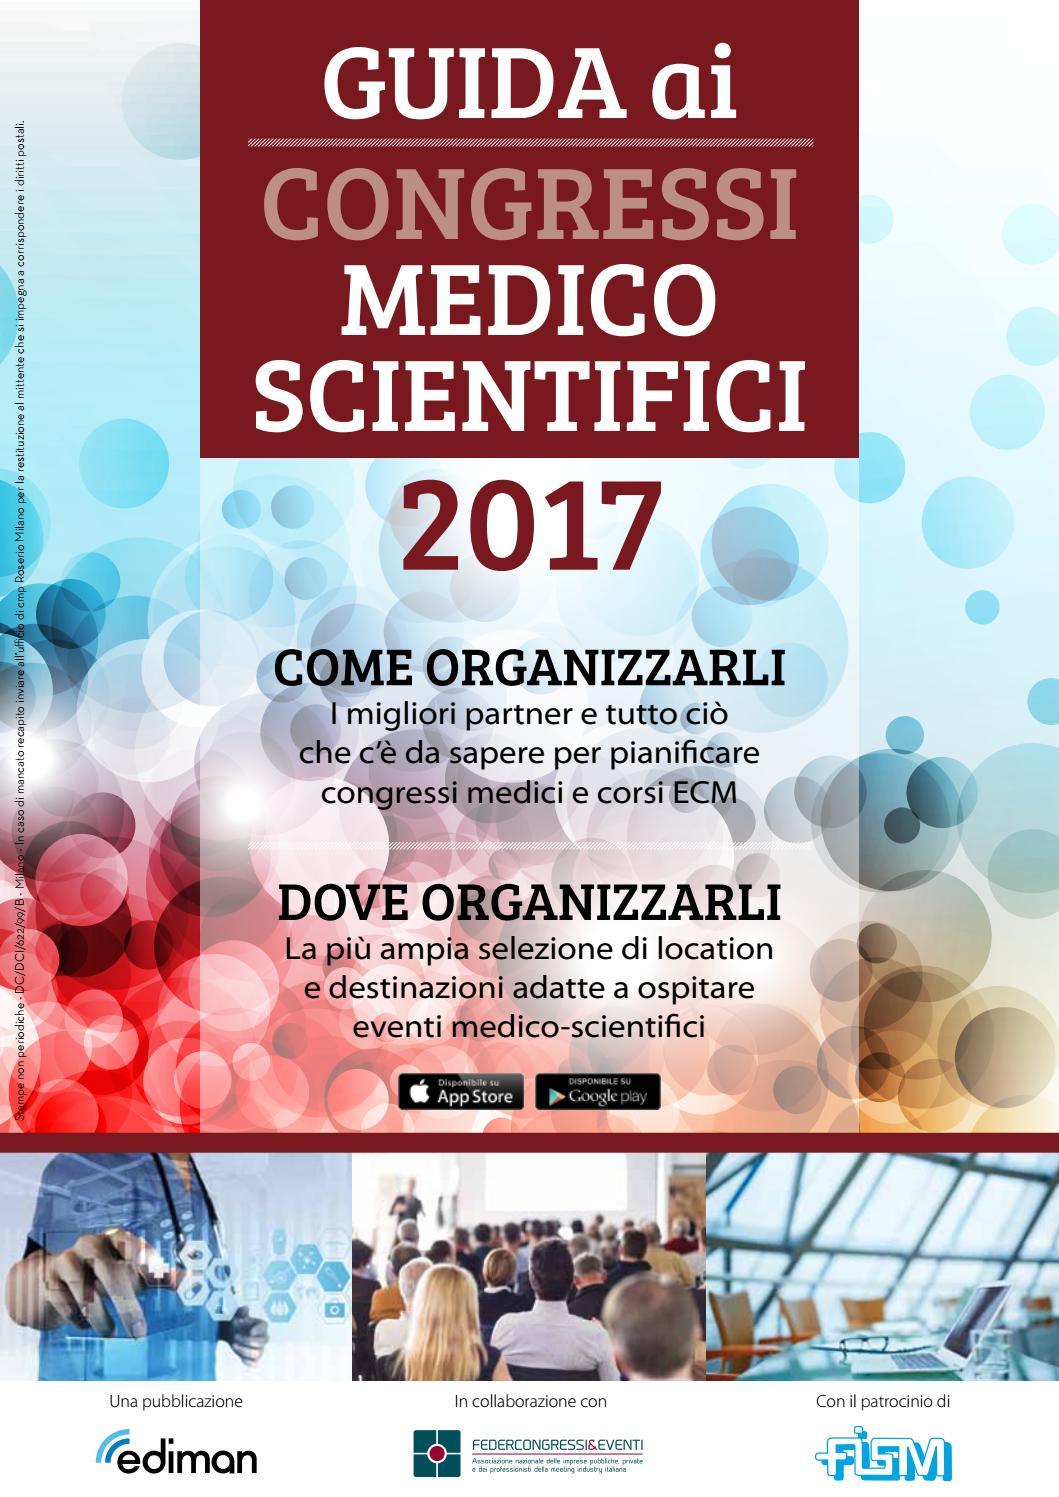 Guida ai Congressi Medico Scientifici 2017 by Ediman - issuu 6bb639b8c8d6